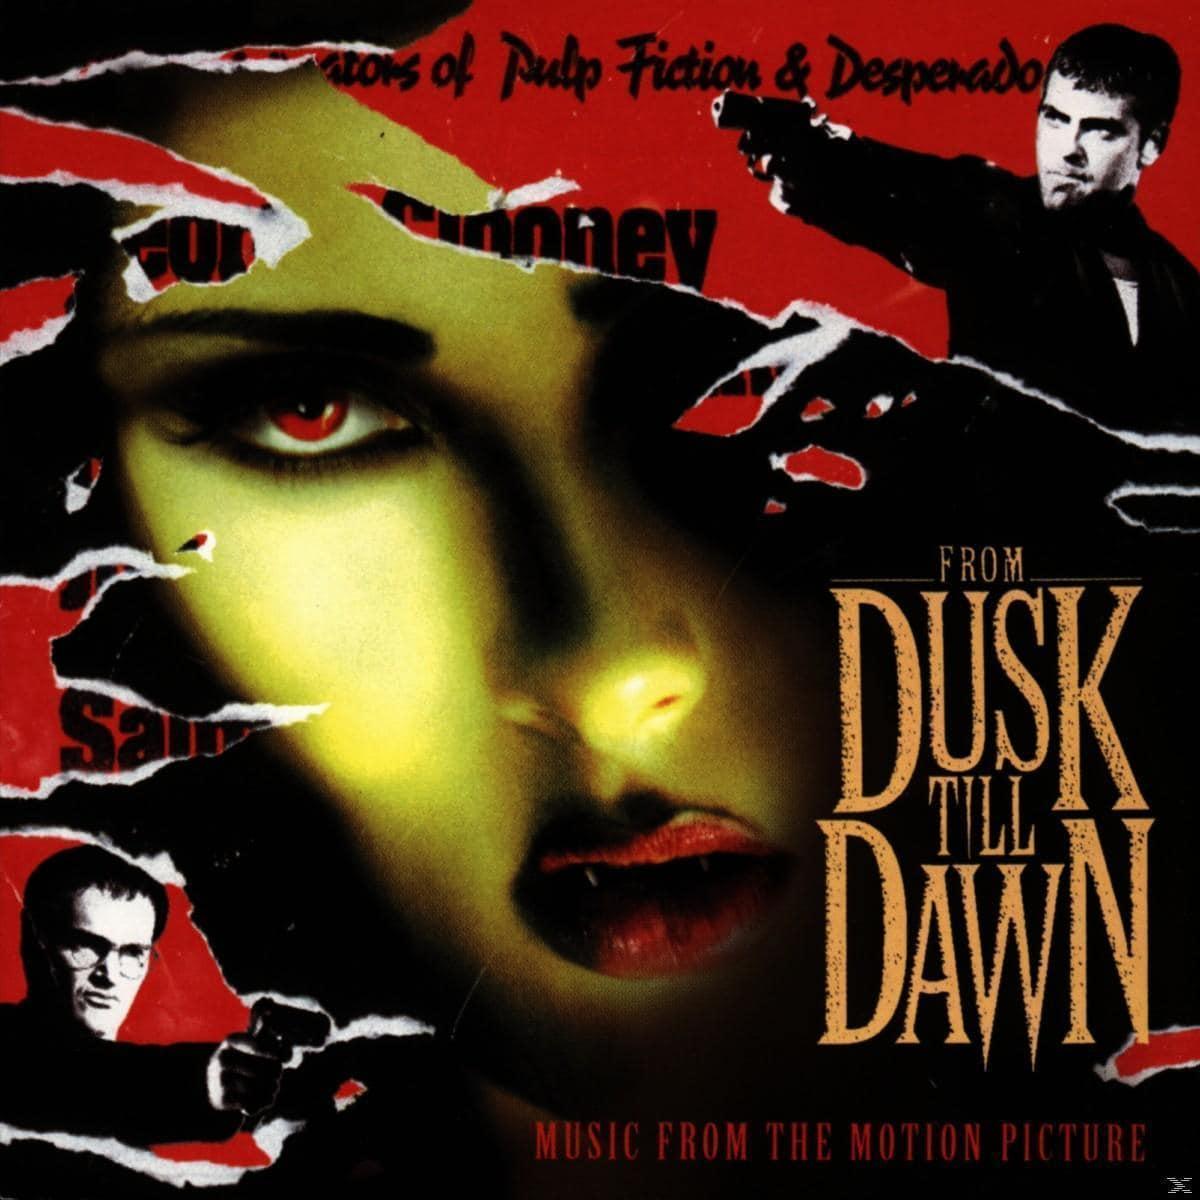 FROM DUSK TILL DAWN - MUSIC FR (VARIOUS) für 7,99 Euro